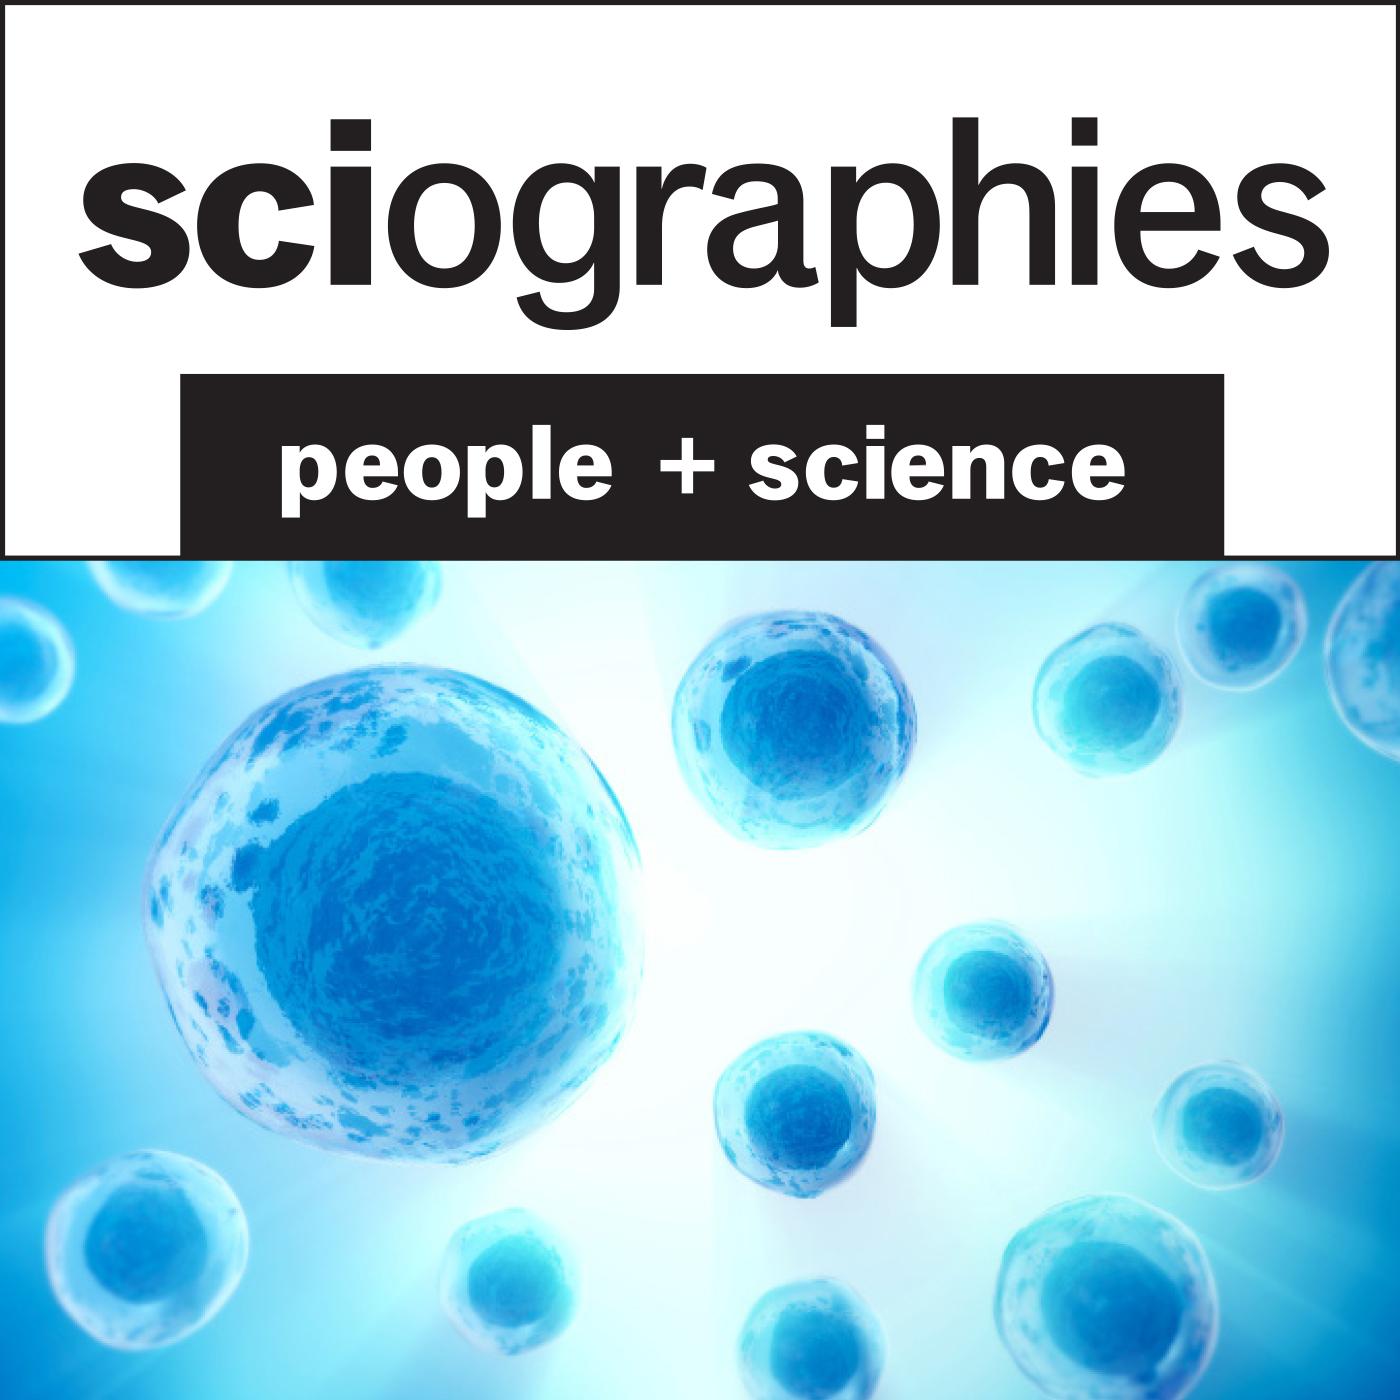 Sciographies